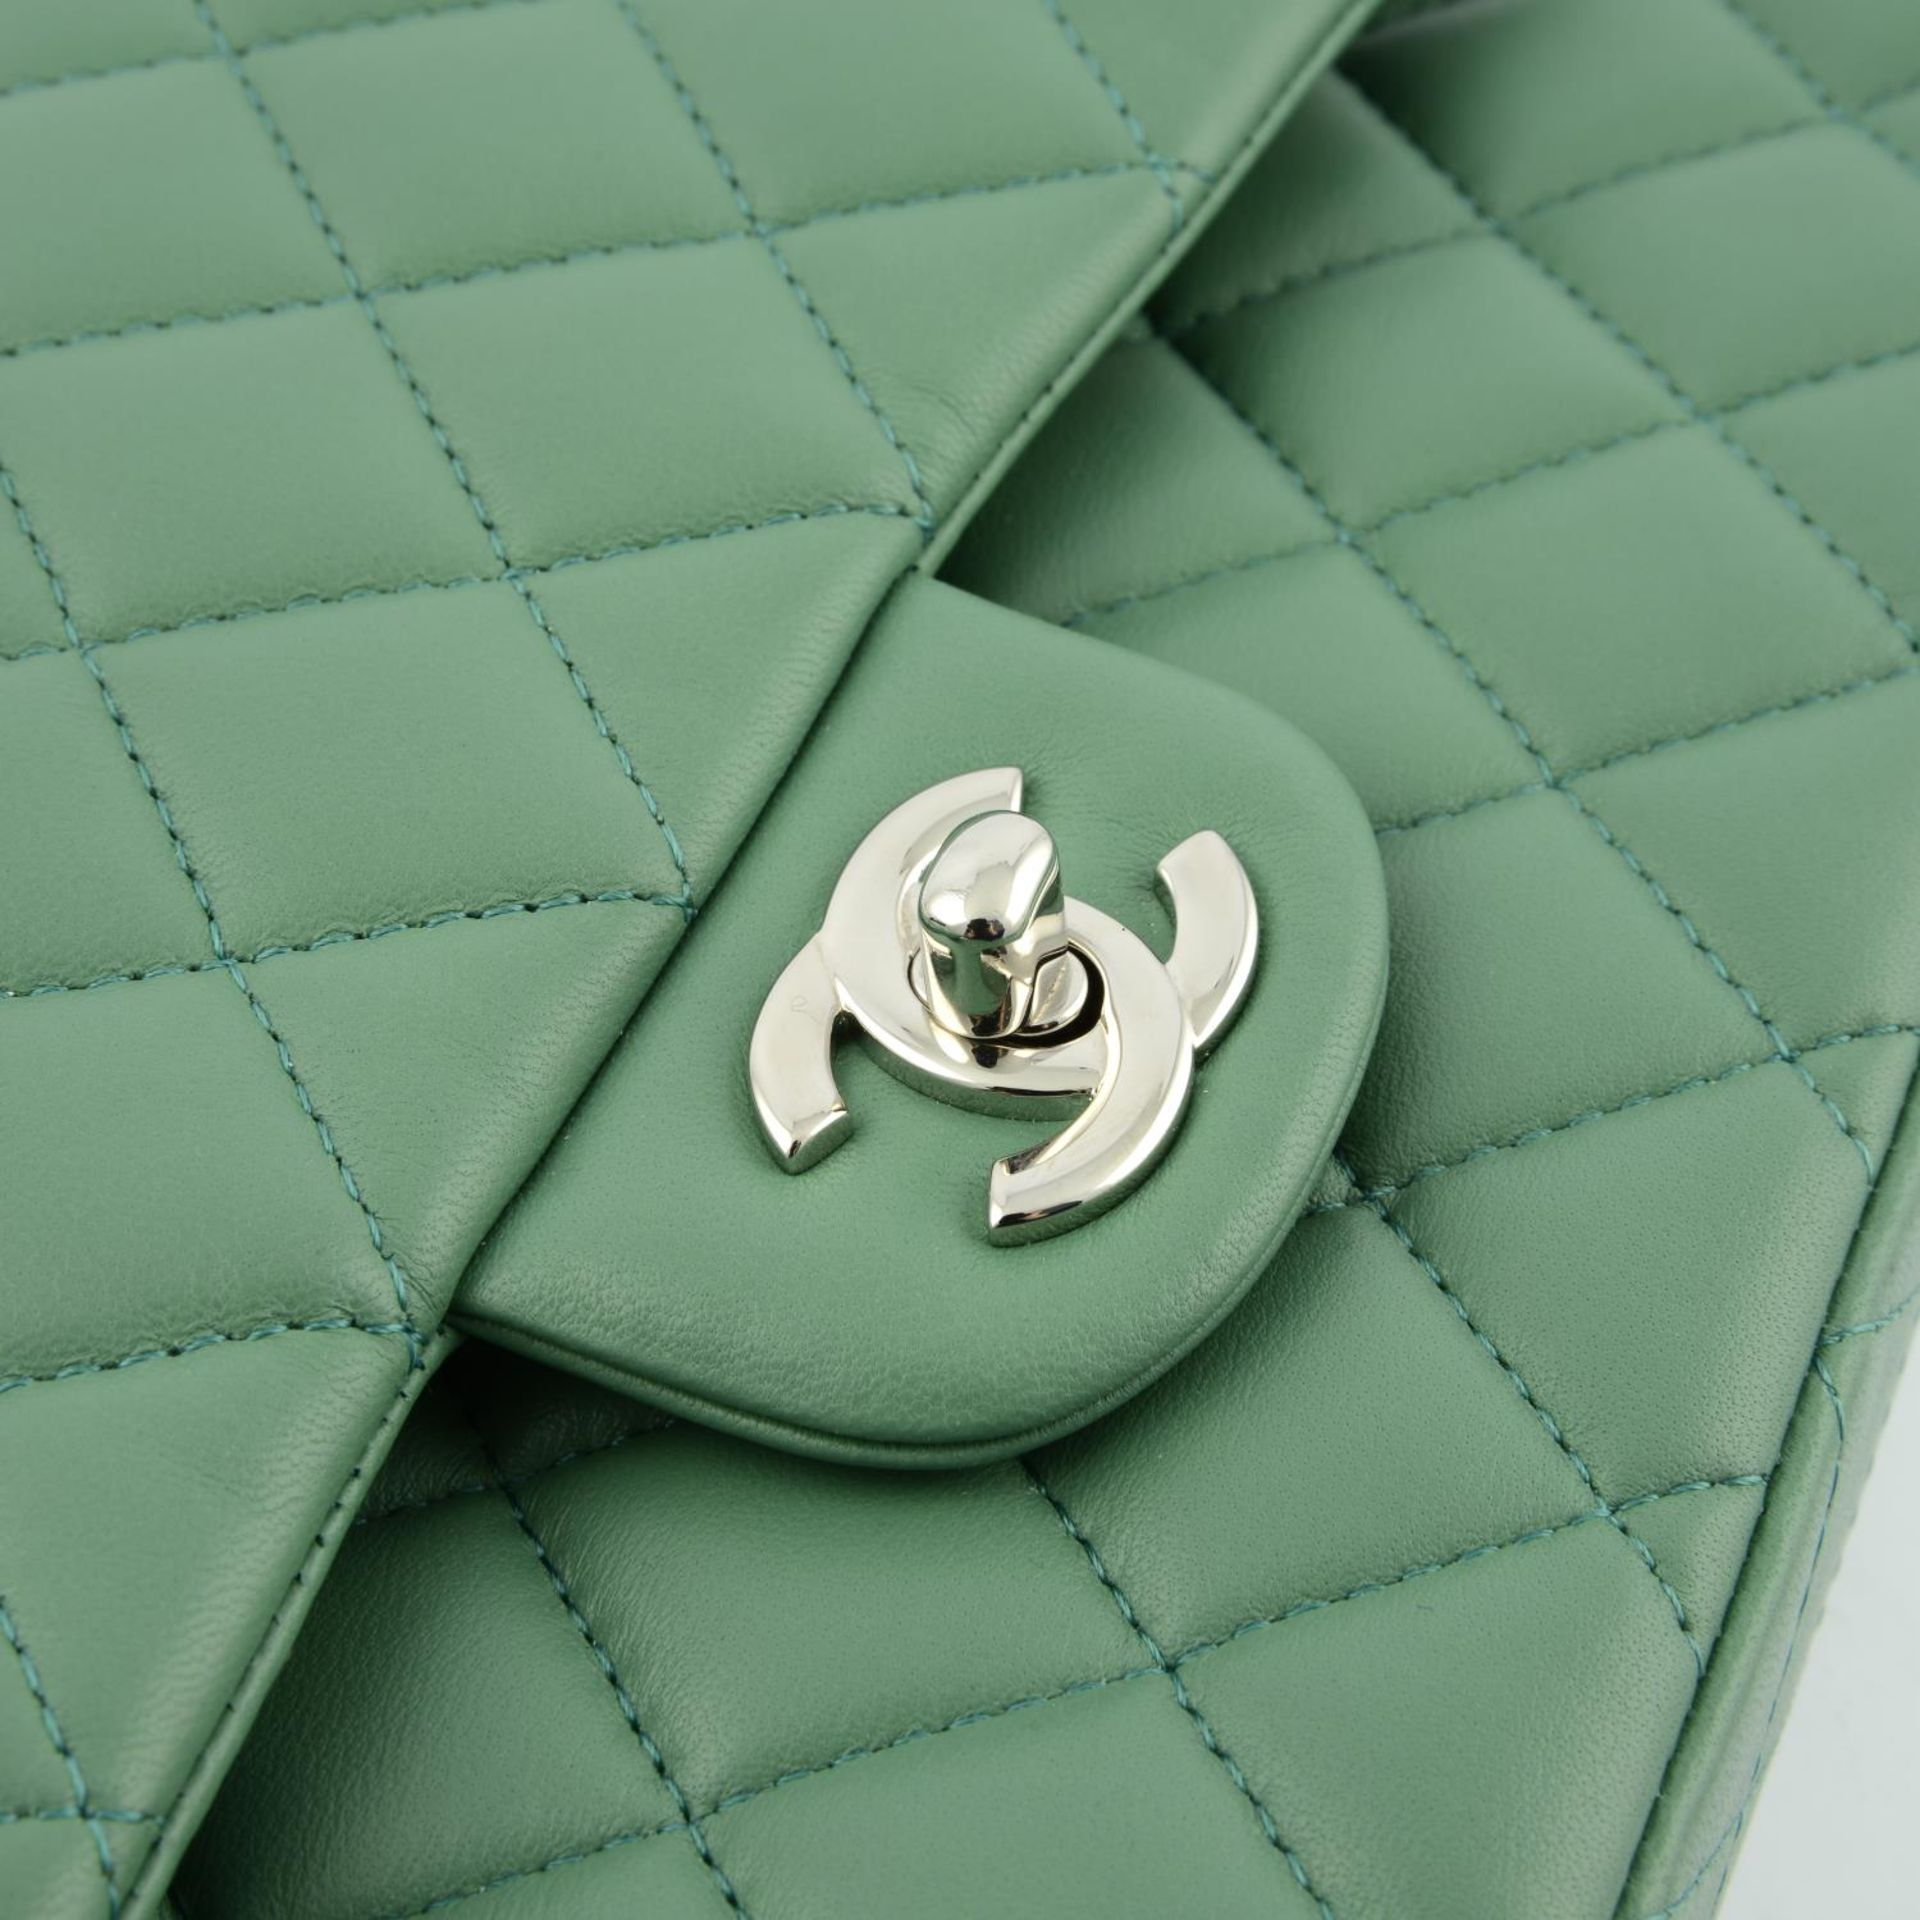 CHANEL - a green medium classic double flap handbag. - Image 6 of 7